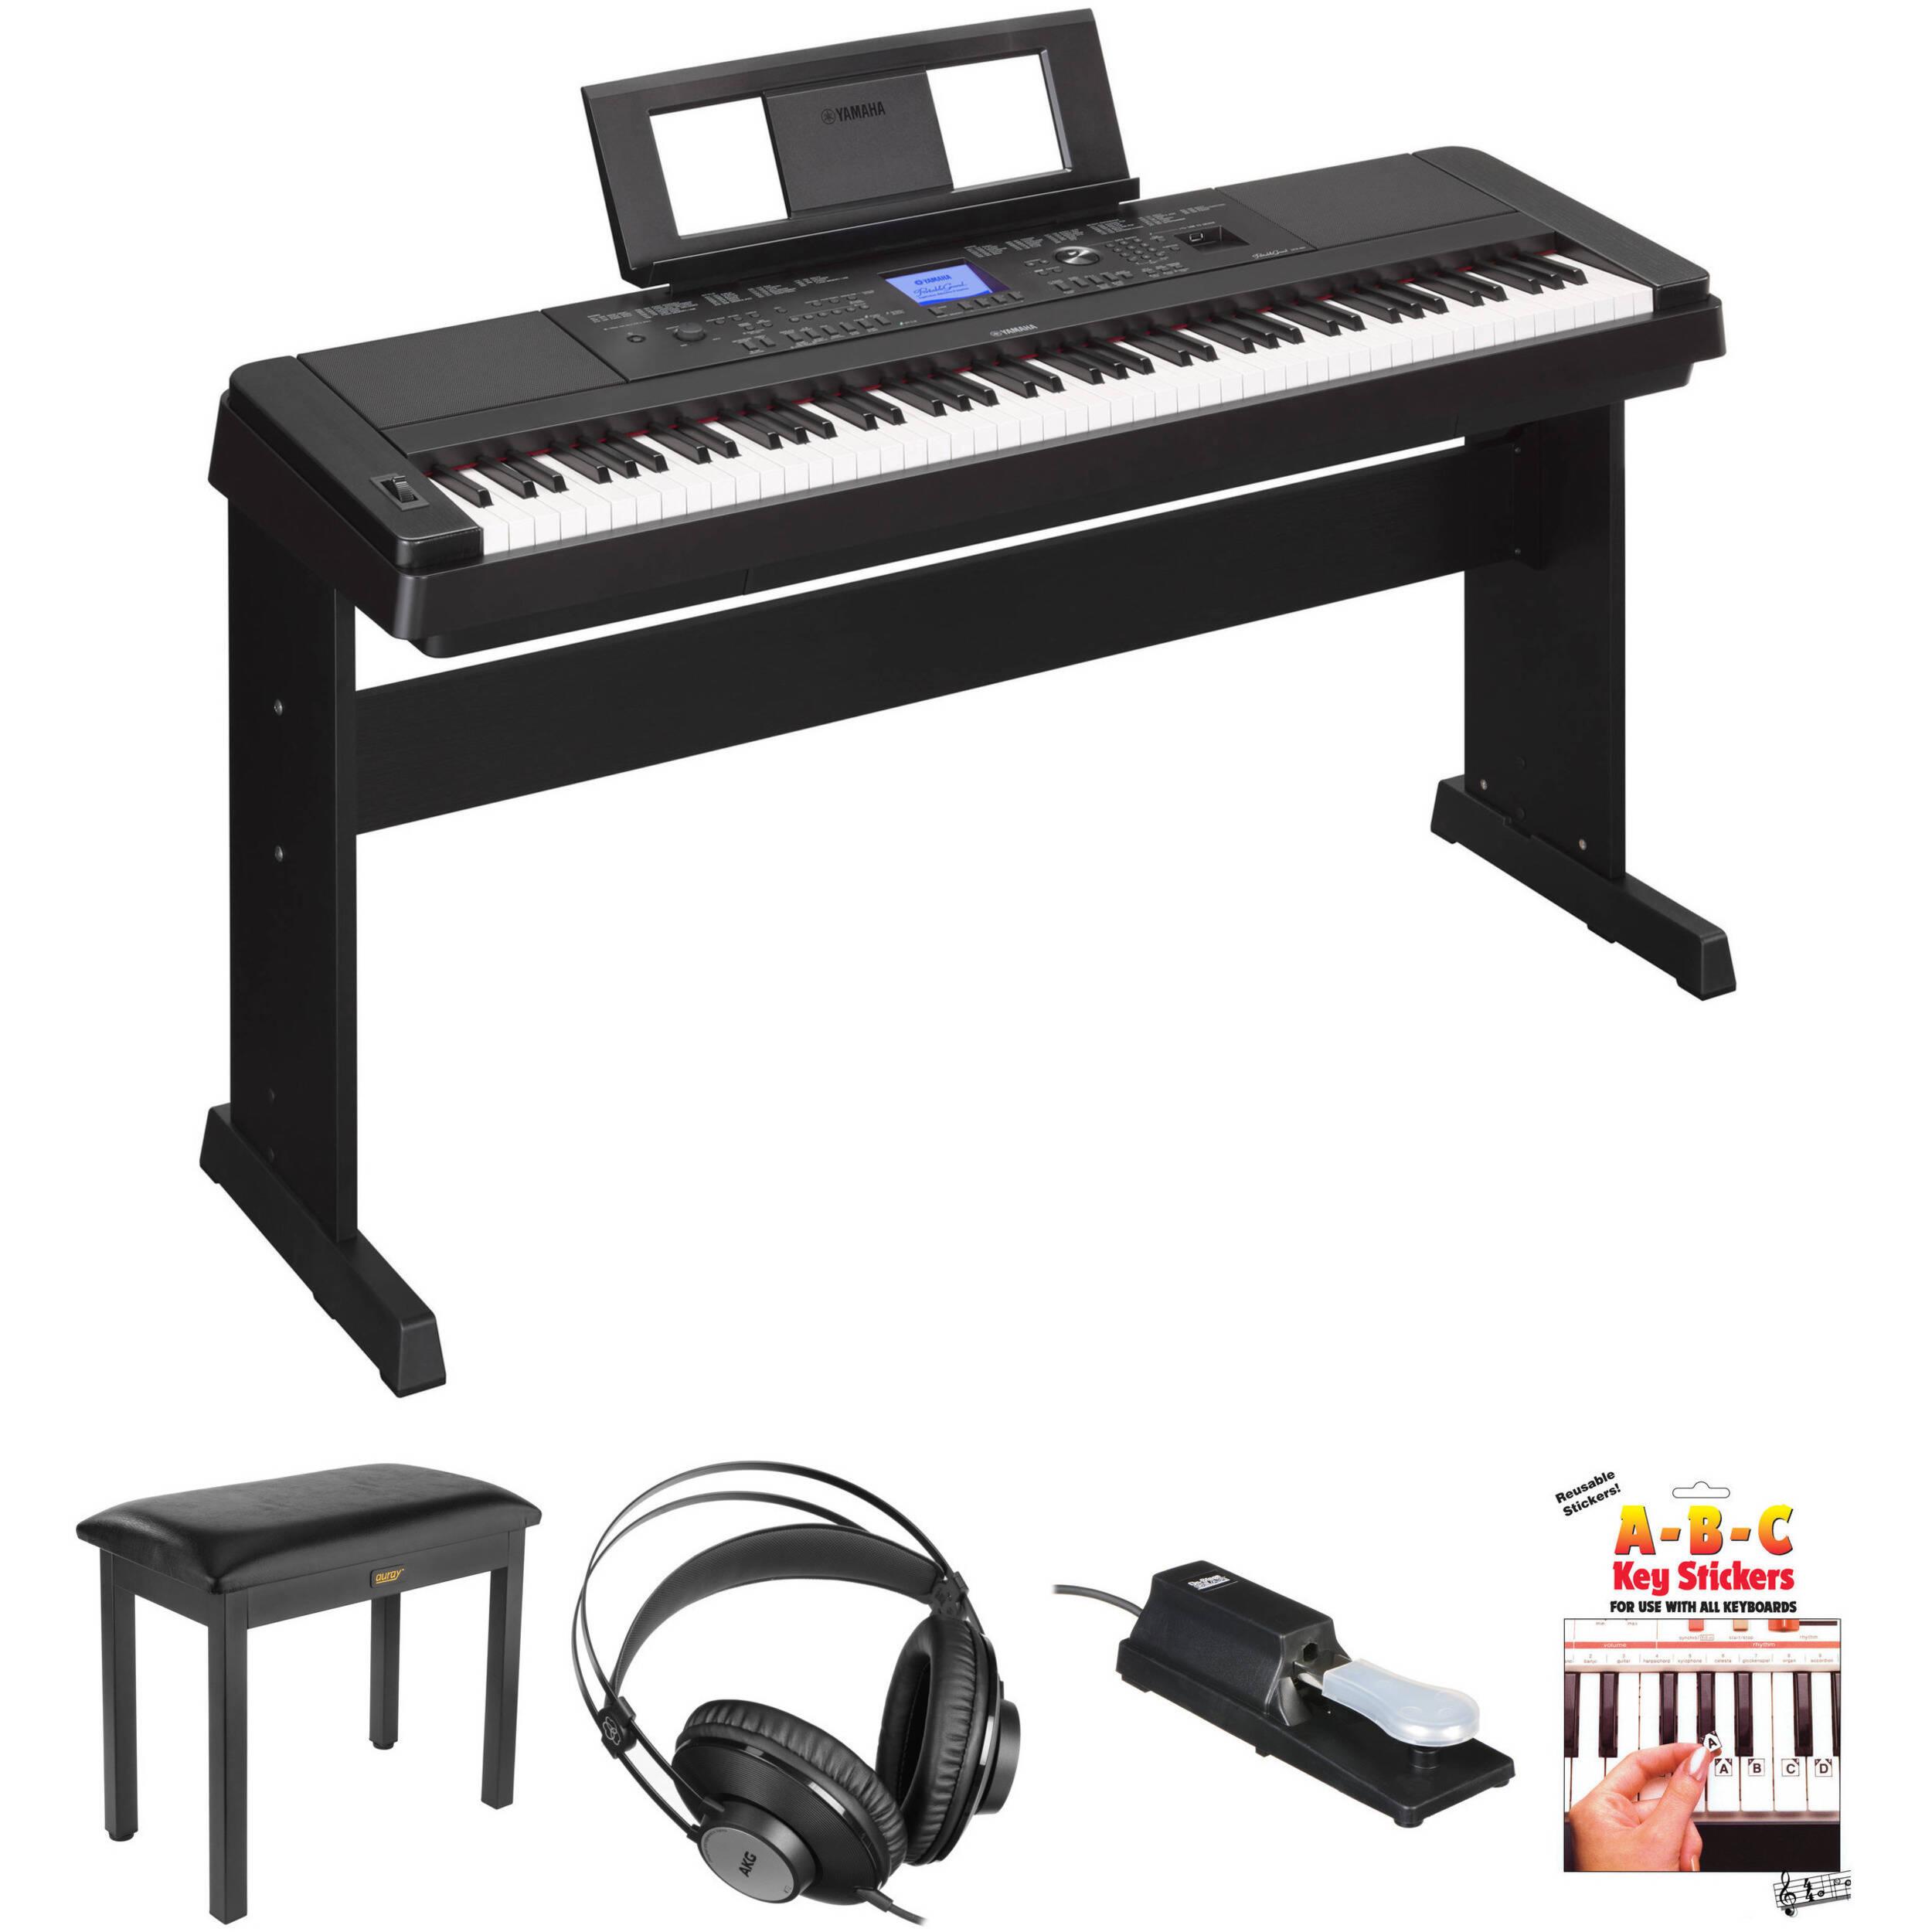 Yamaha DGX-660 88-Key Digital Piano Kit with Bench, Pedal